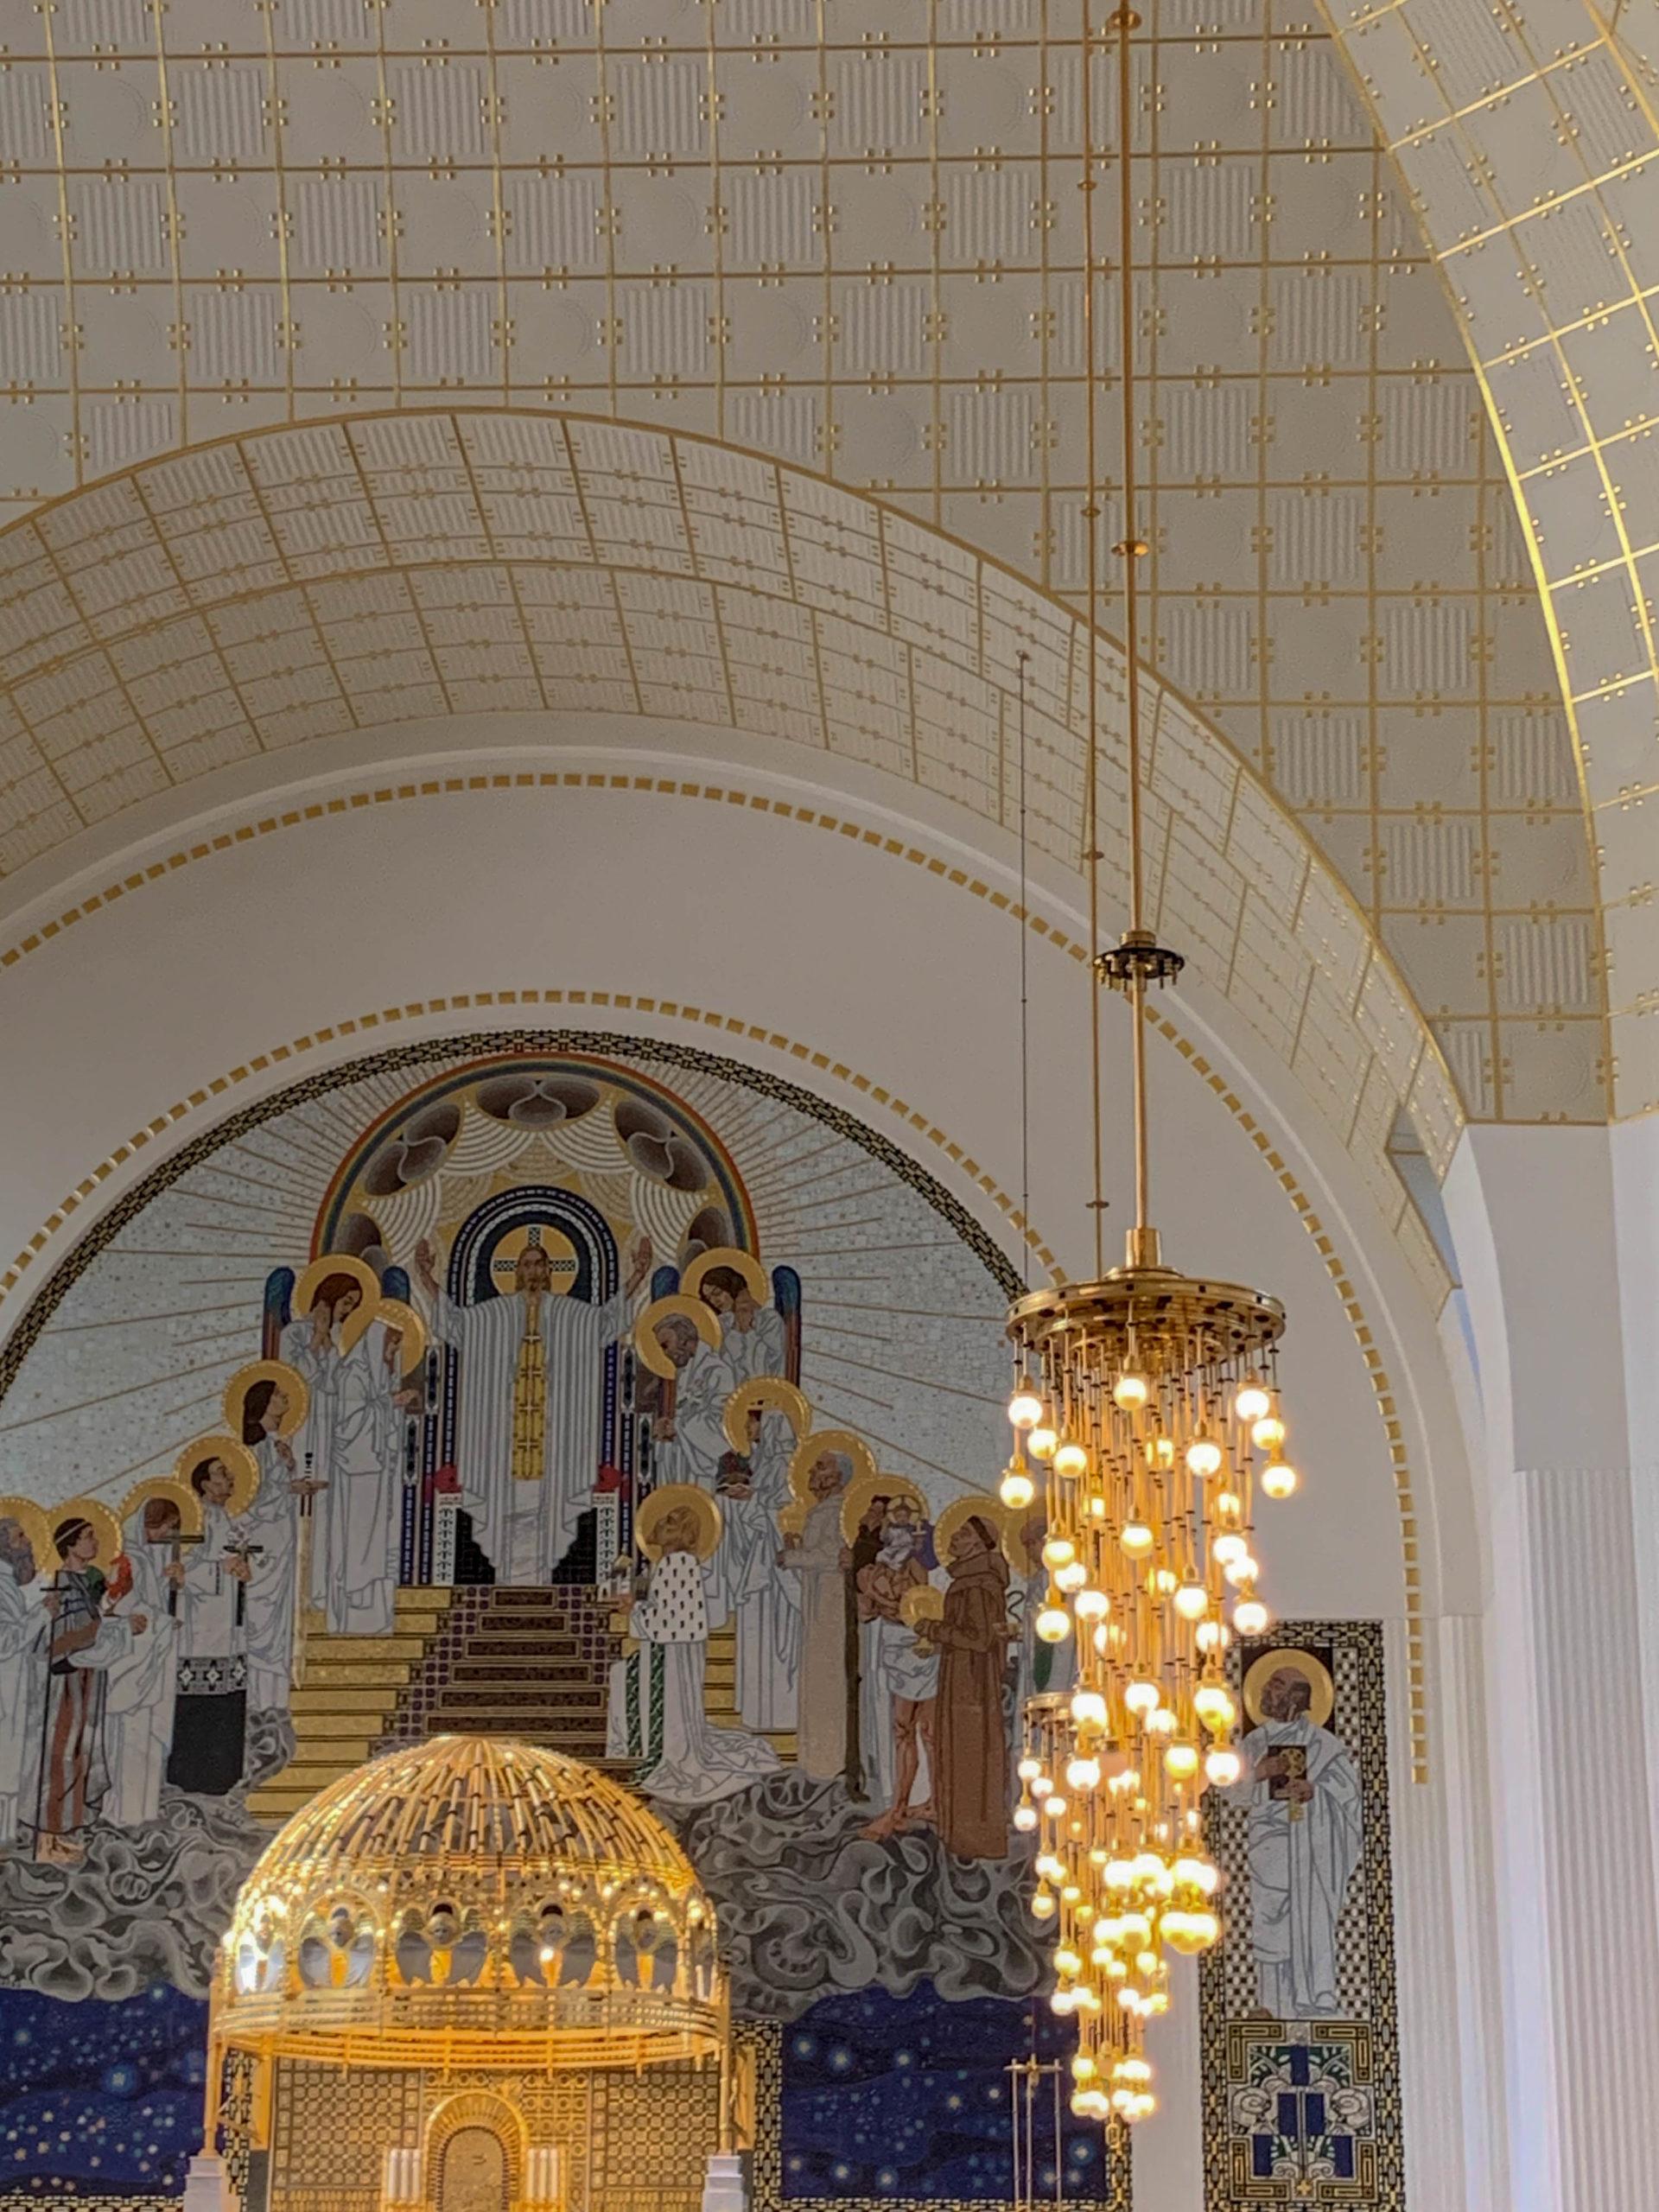 Kirche am Steinhof, 1904-1907. Architekt: Otto Wagner